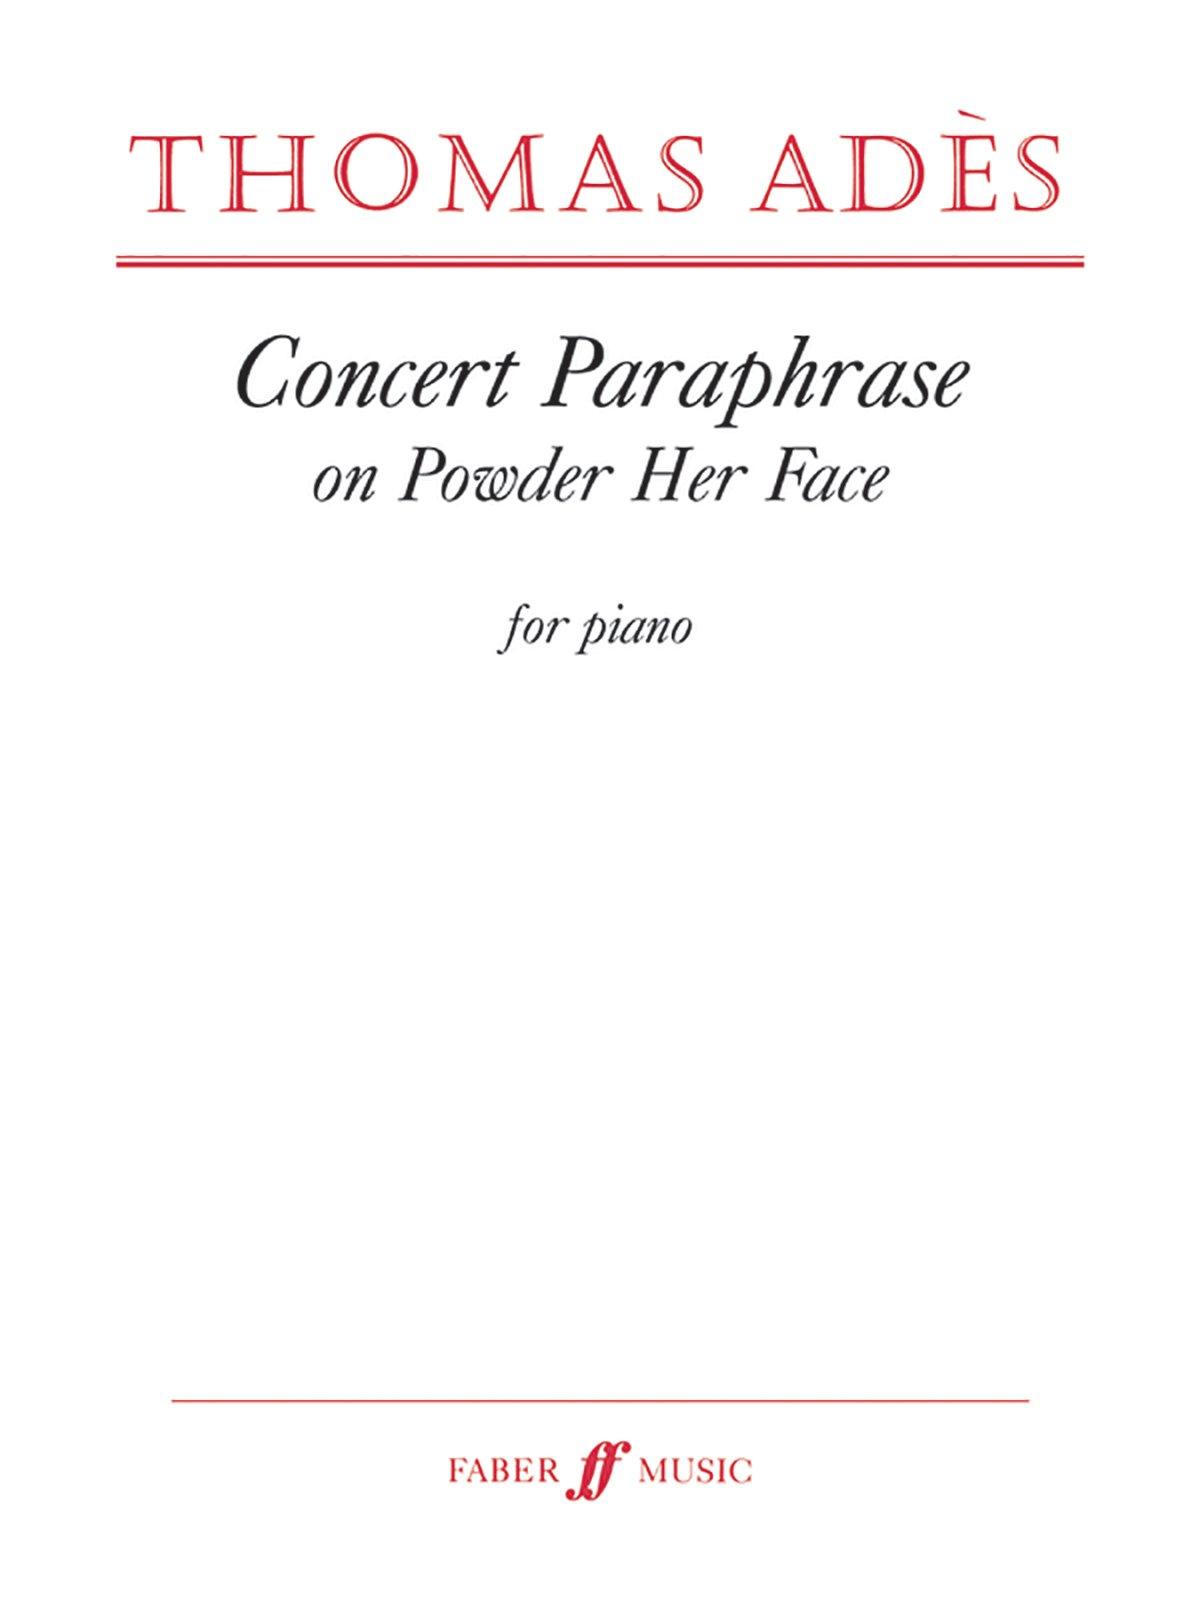 Concert Paraphrase on Powder Her Face (Faber Edition) pdf